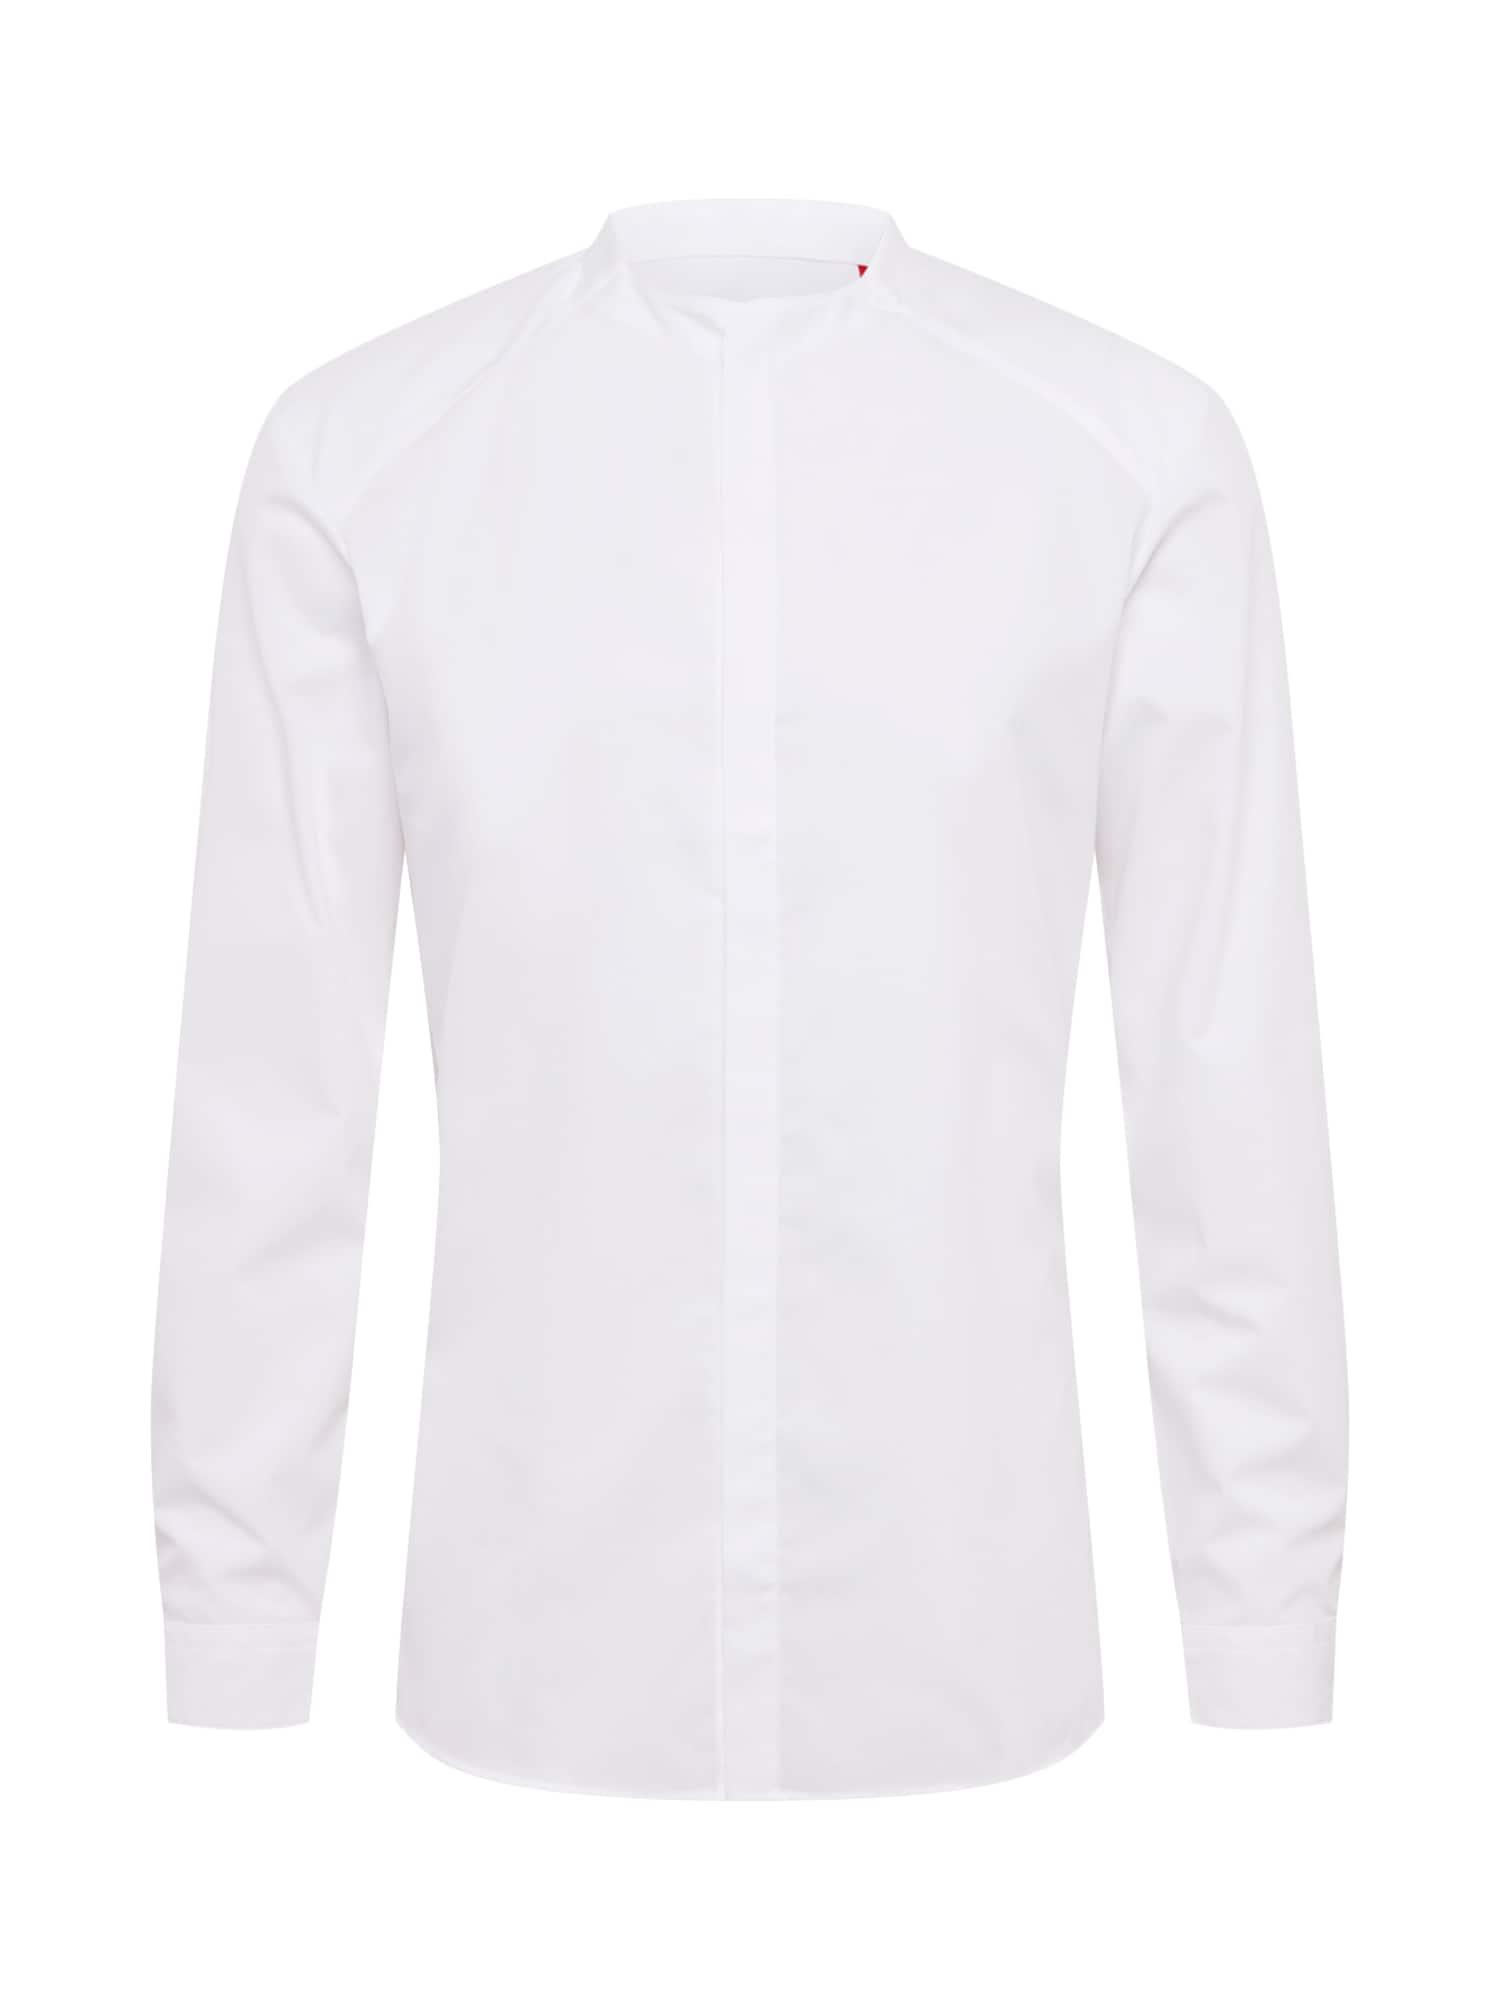 Společenská košile Ertis bílá HUGO